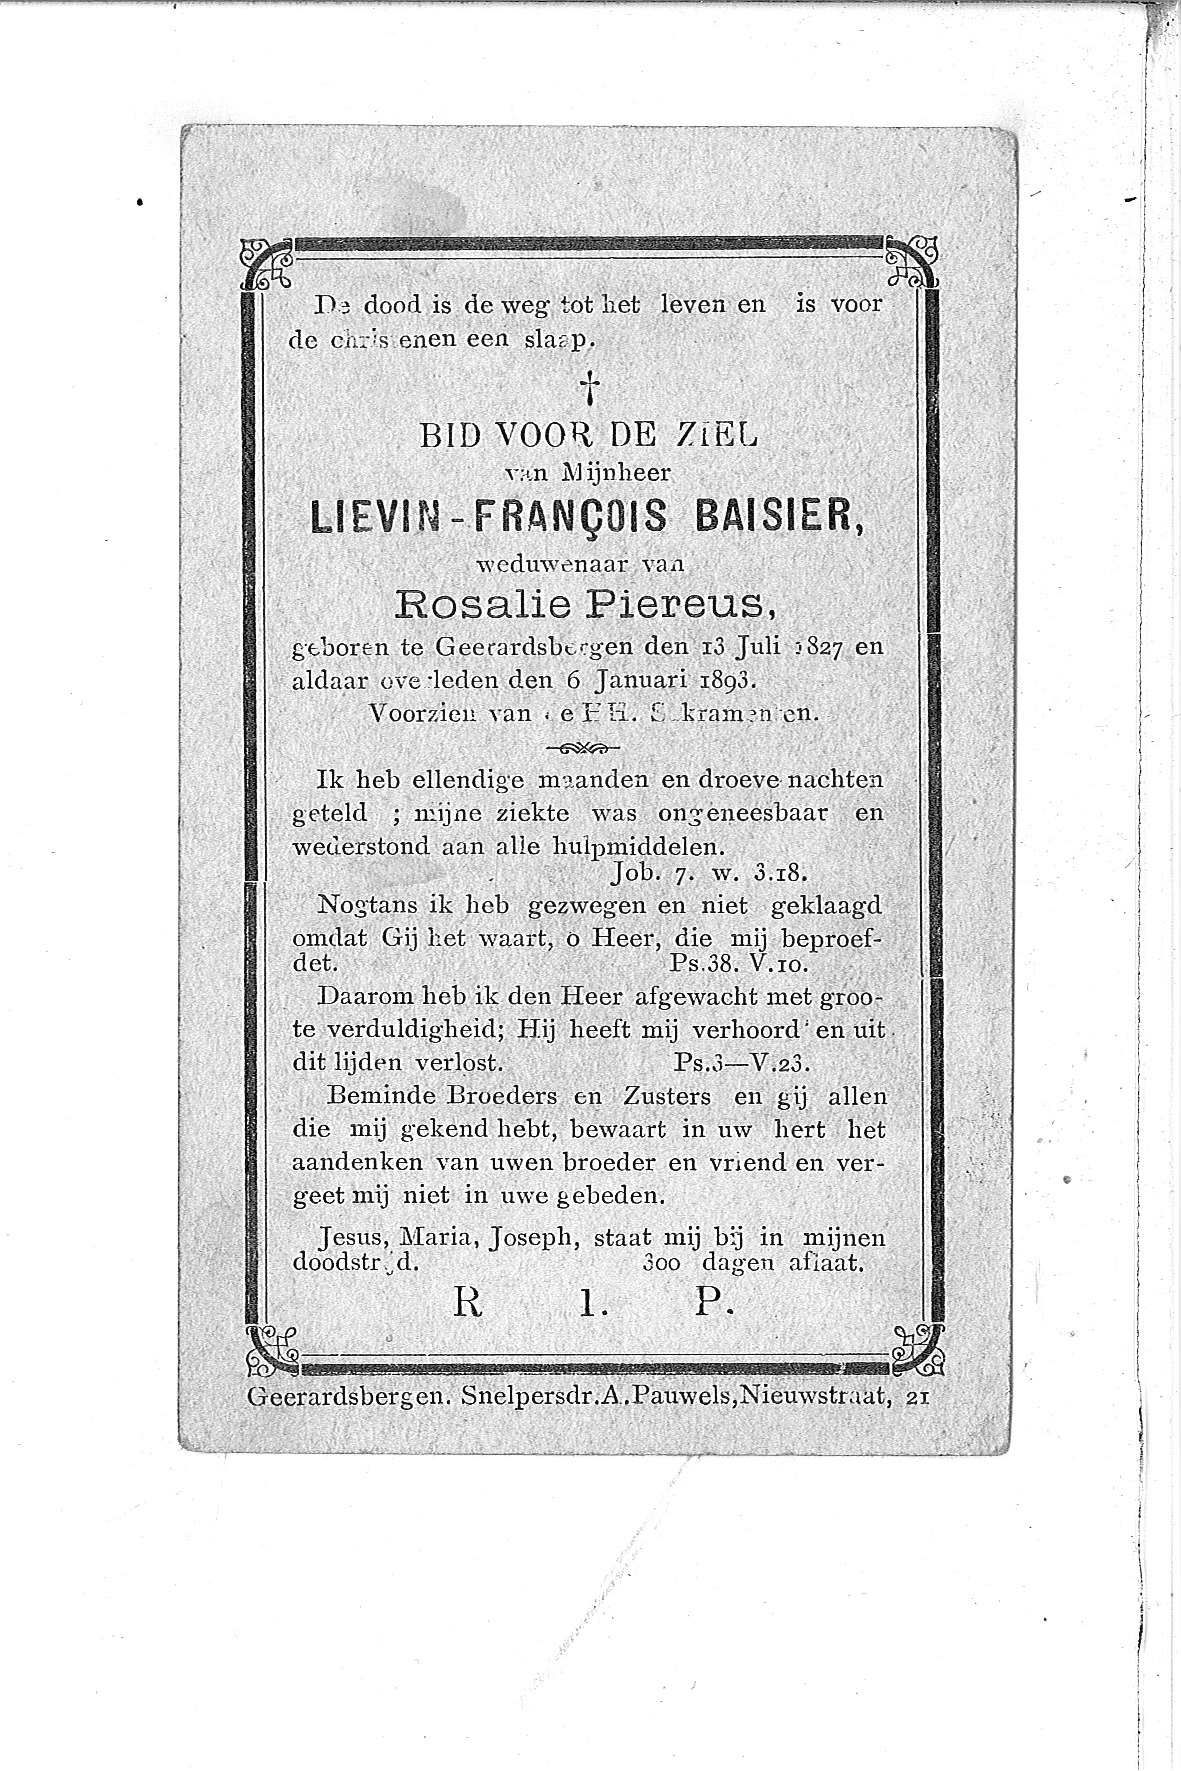 Lievin-François(1893)20101006094231_00022.jpg